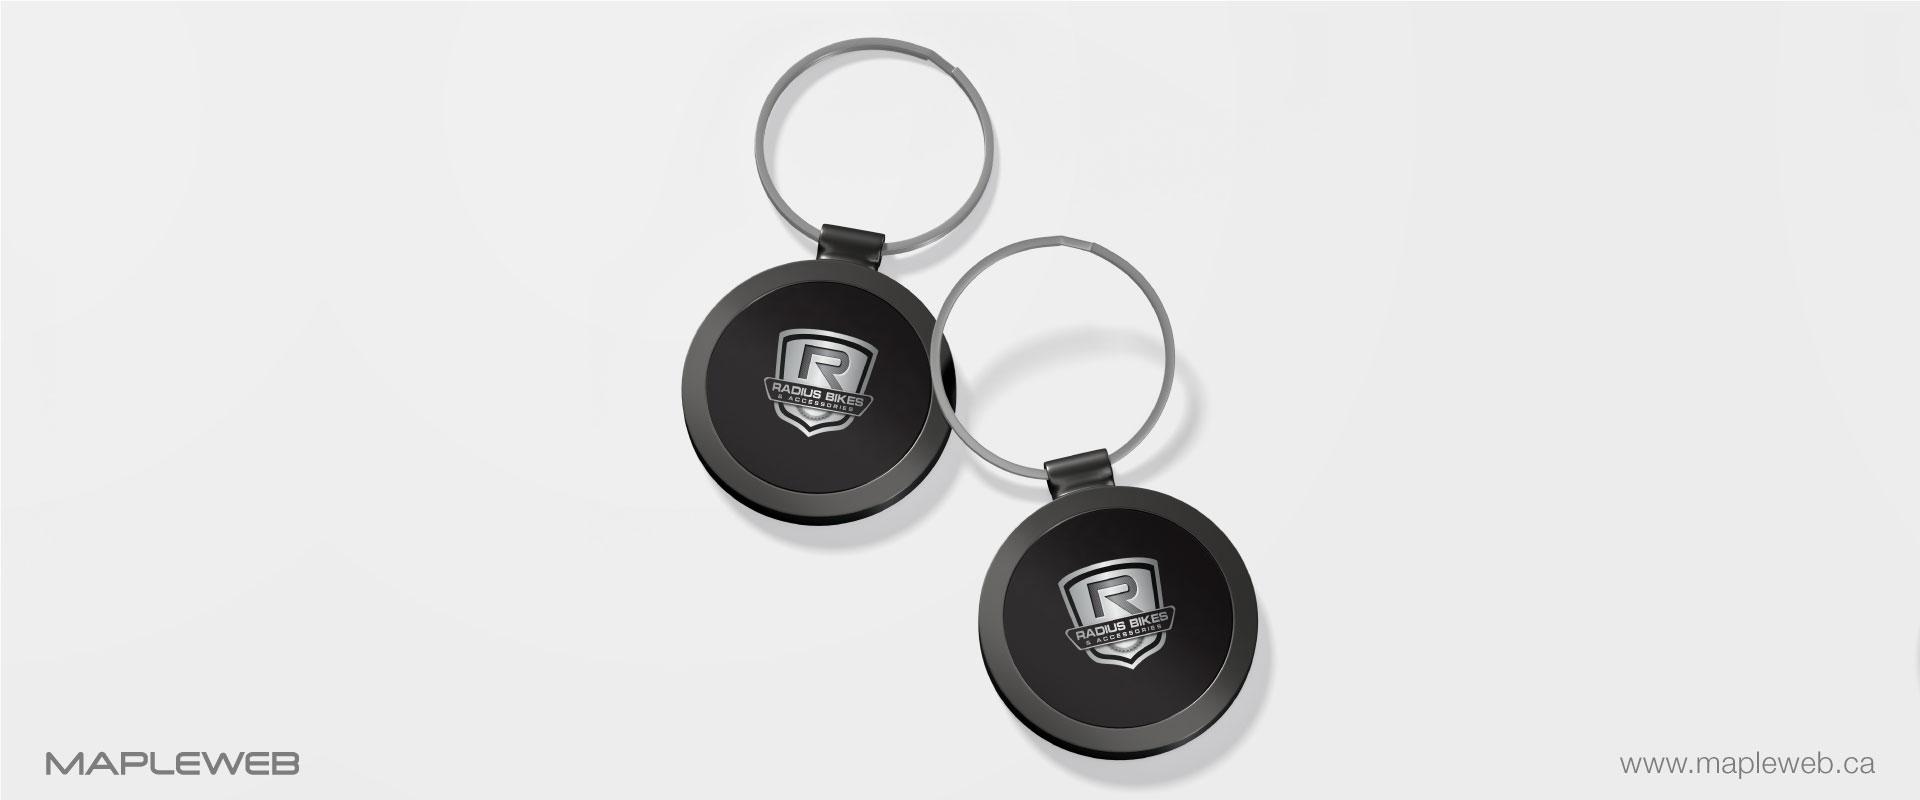 radius-bikes-brand-logo-design-by-mapleweb-vancouver-canada-keychain-mock